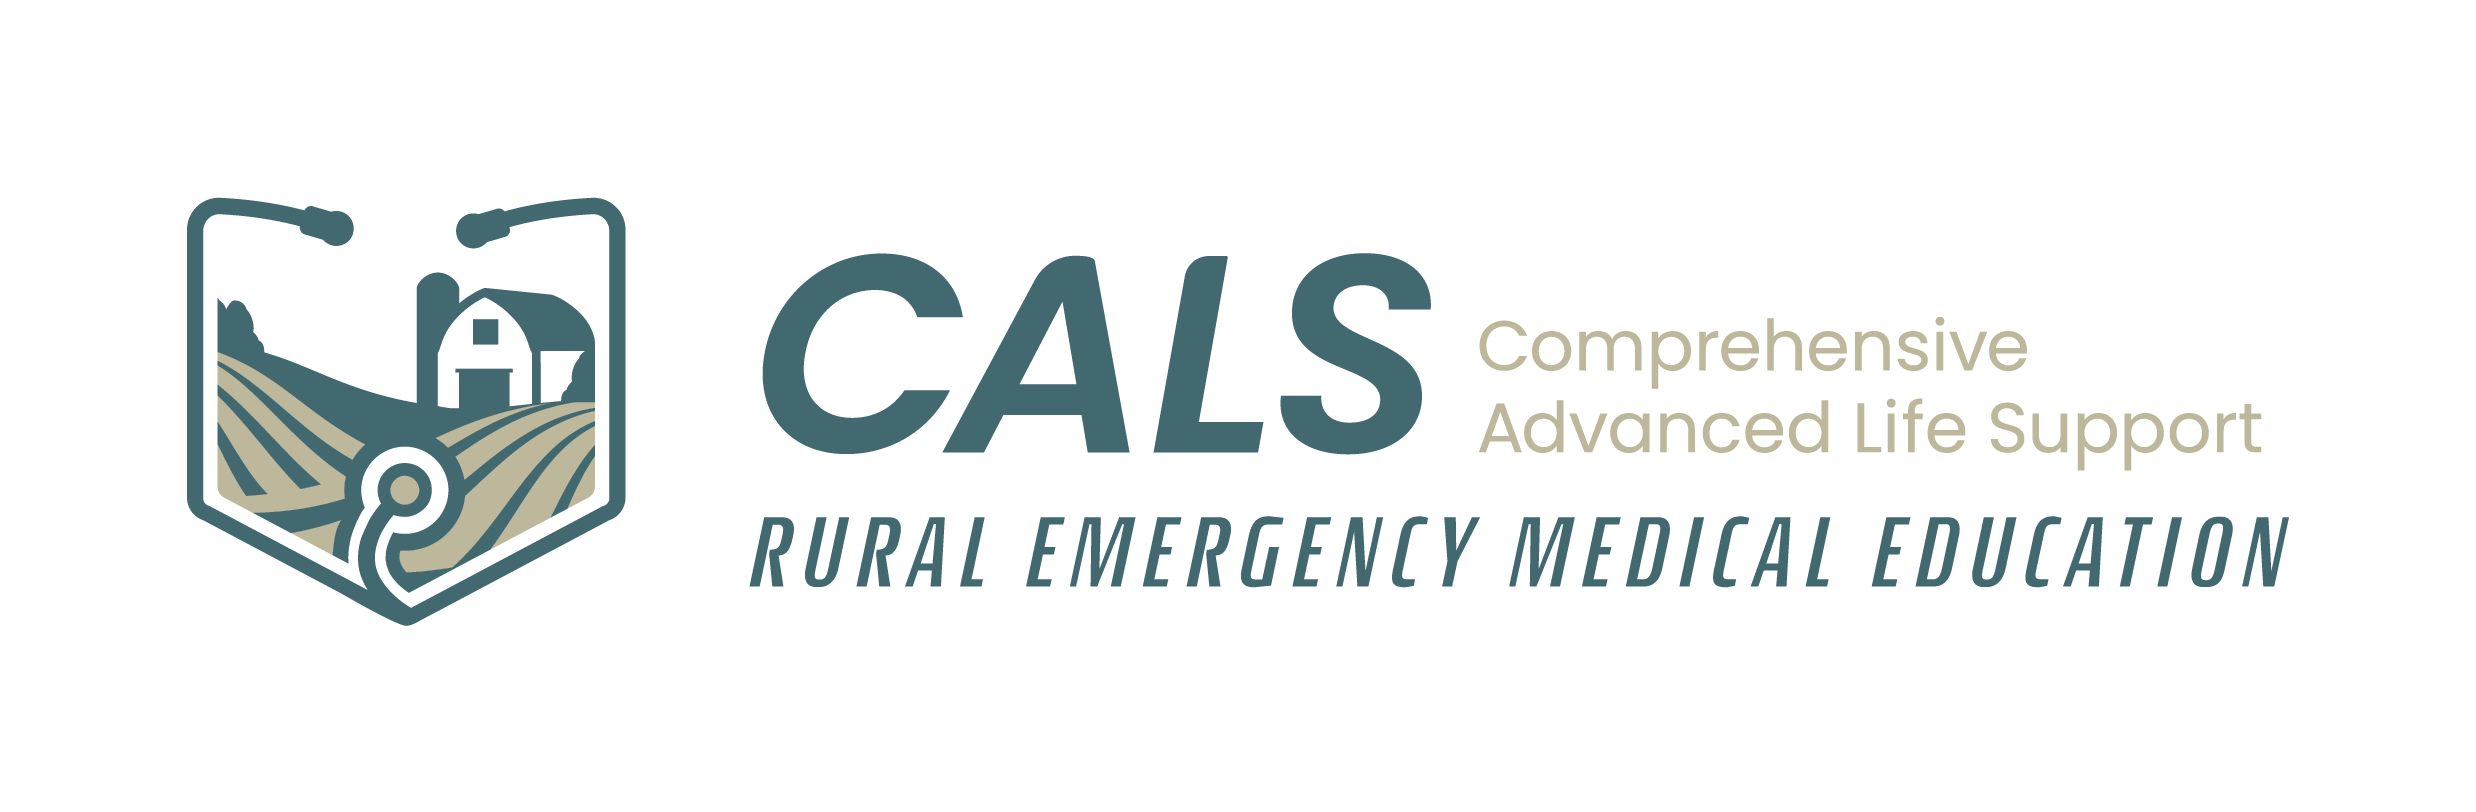 CALS Program